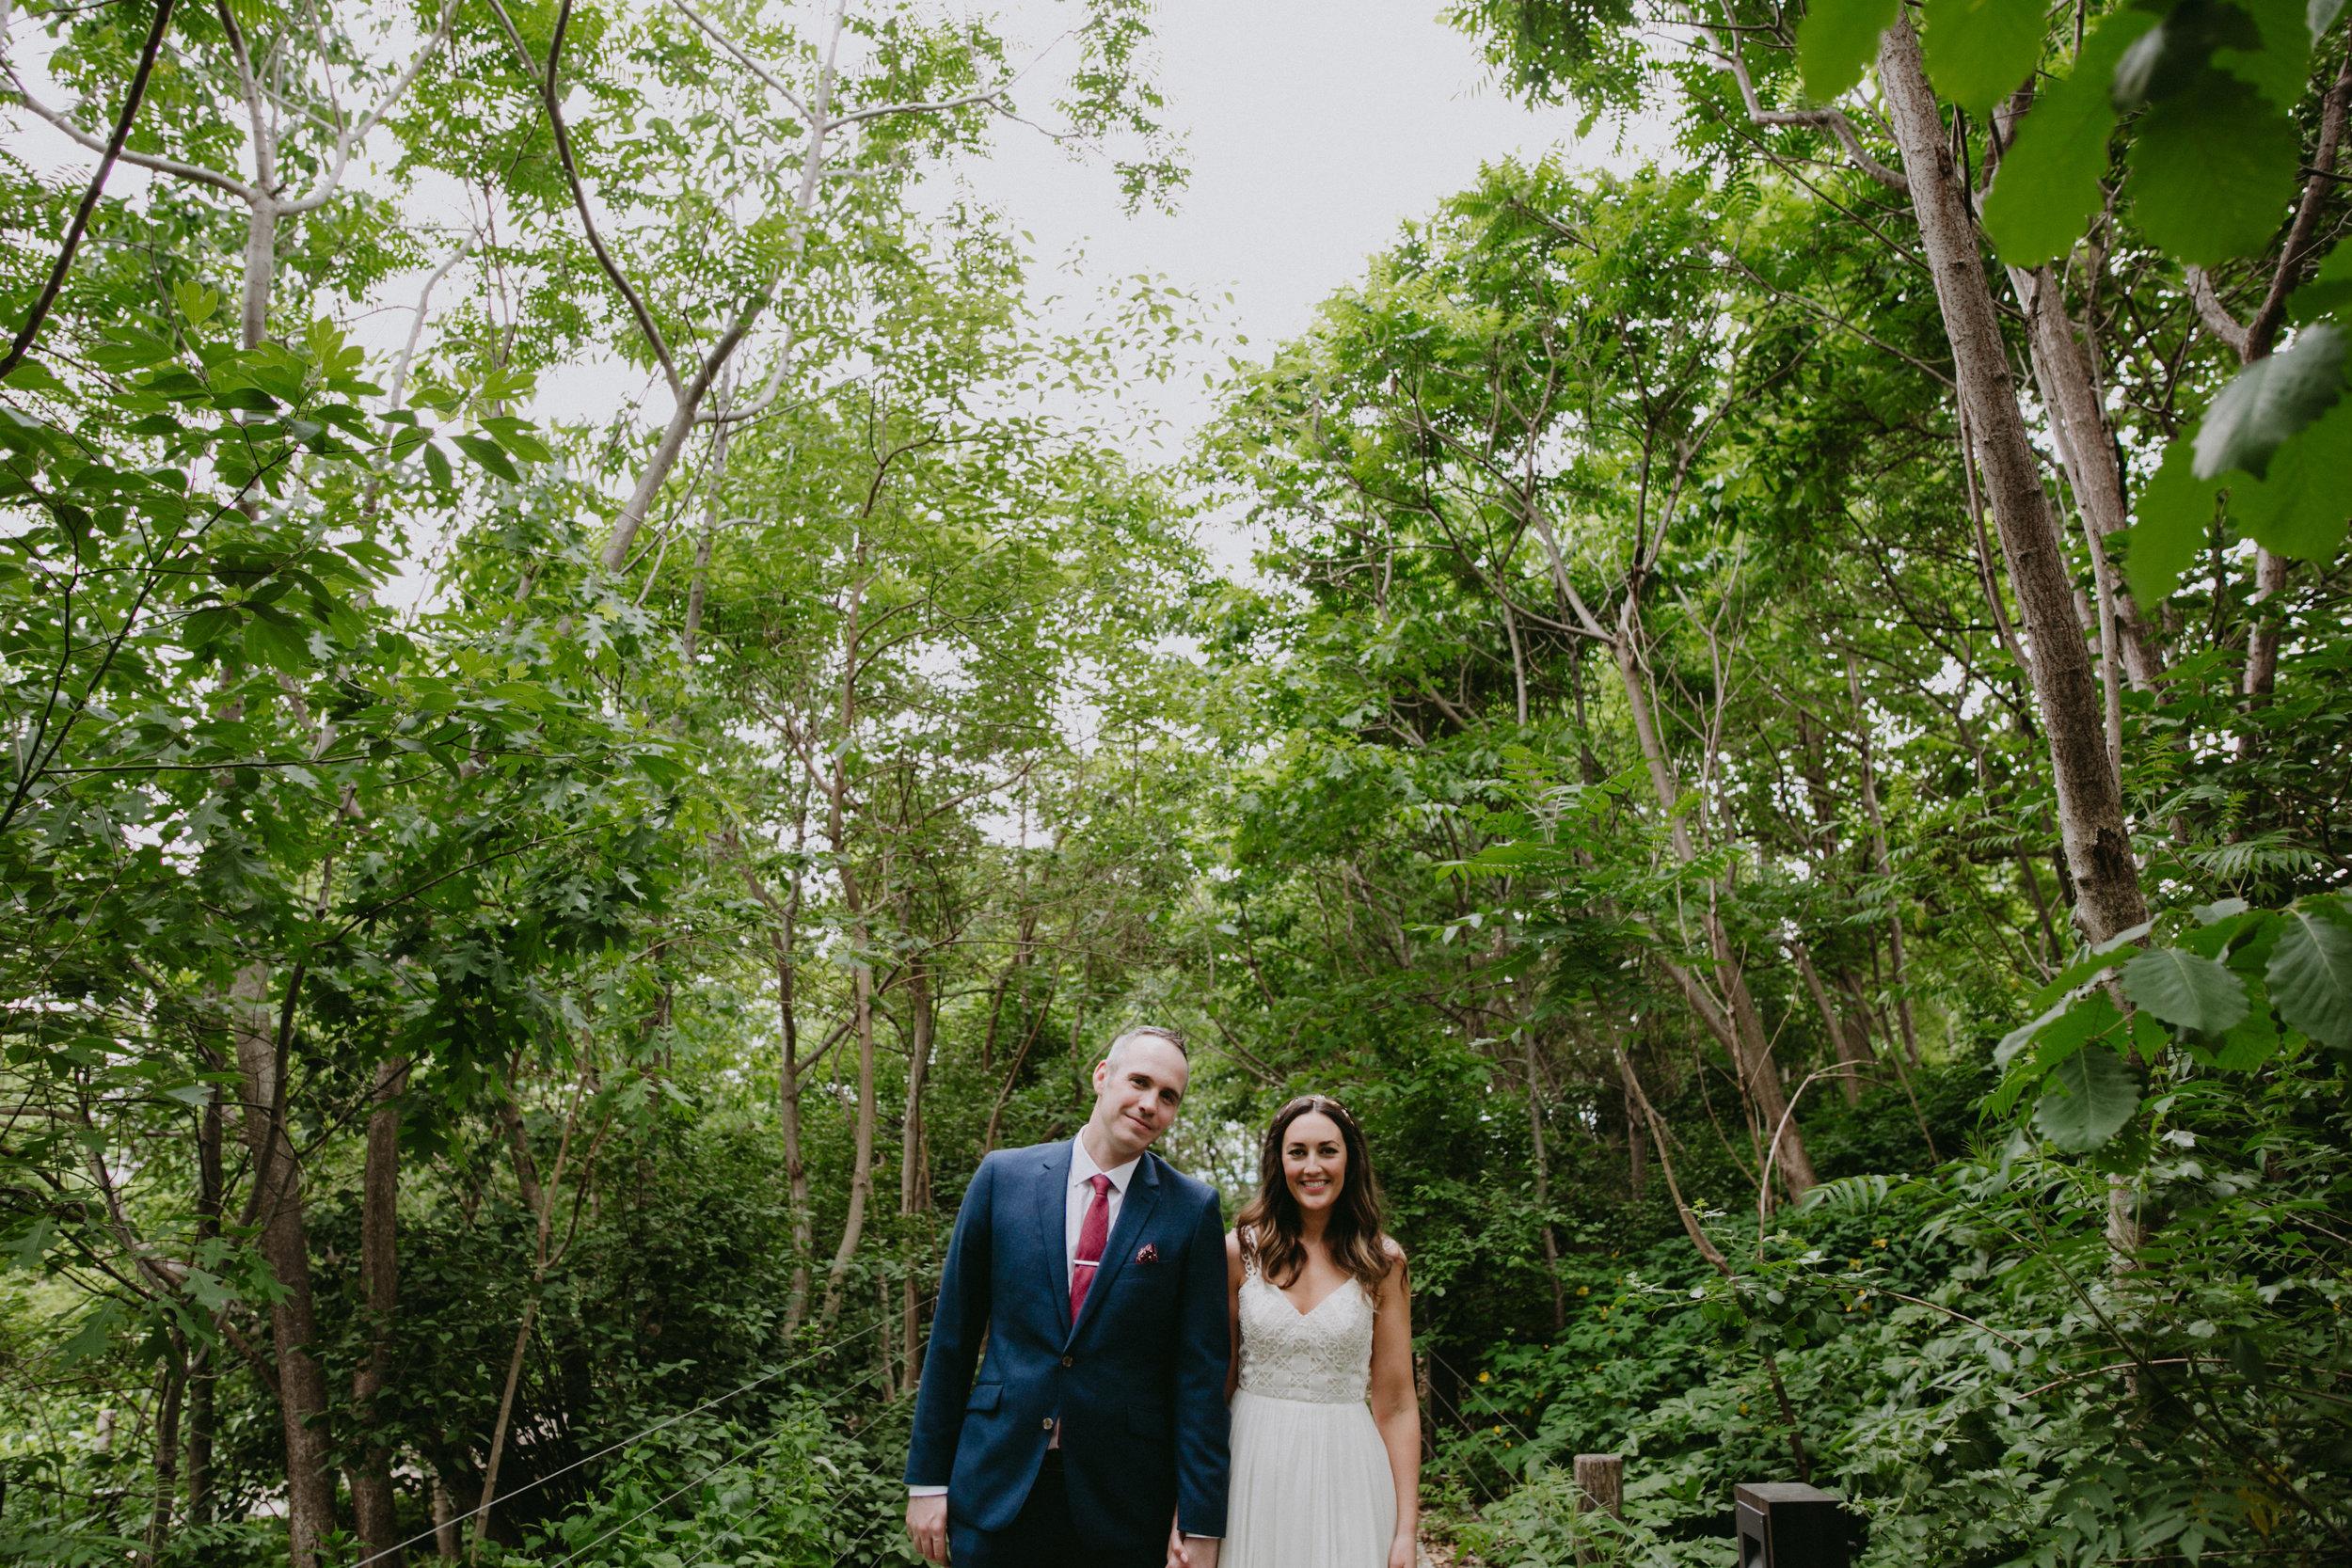 501Union_Brooklyn_Wedding_Photographer_Chellise_Michael_Photography-110.jpg